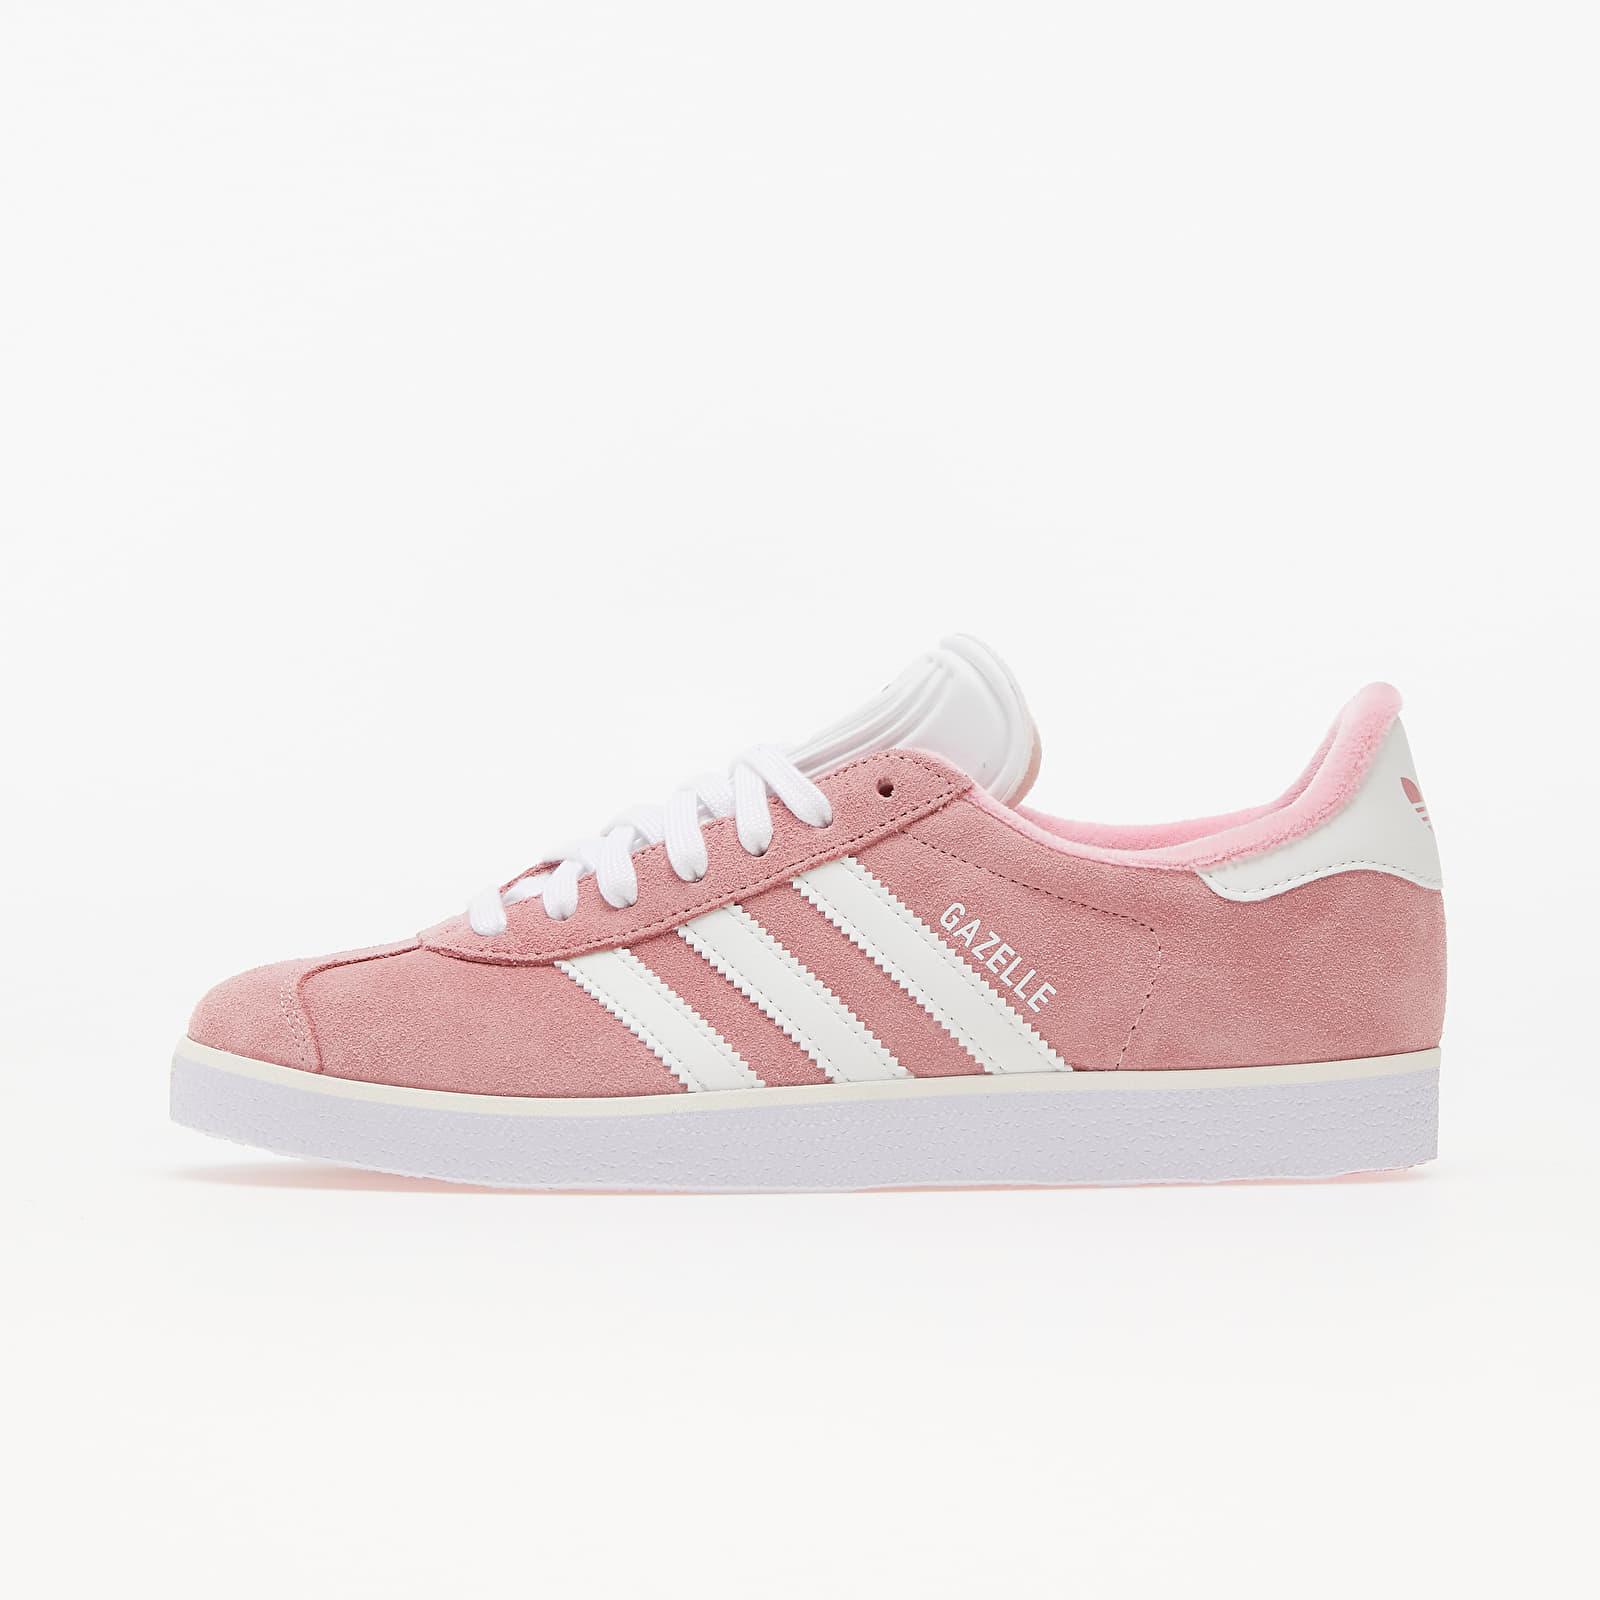 adidas Gazelle W Light Pink/ Core White/ Silver Metallic EUR 36 2/3